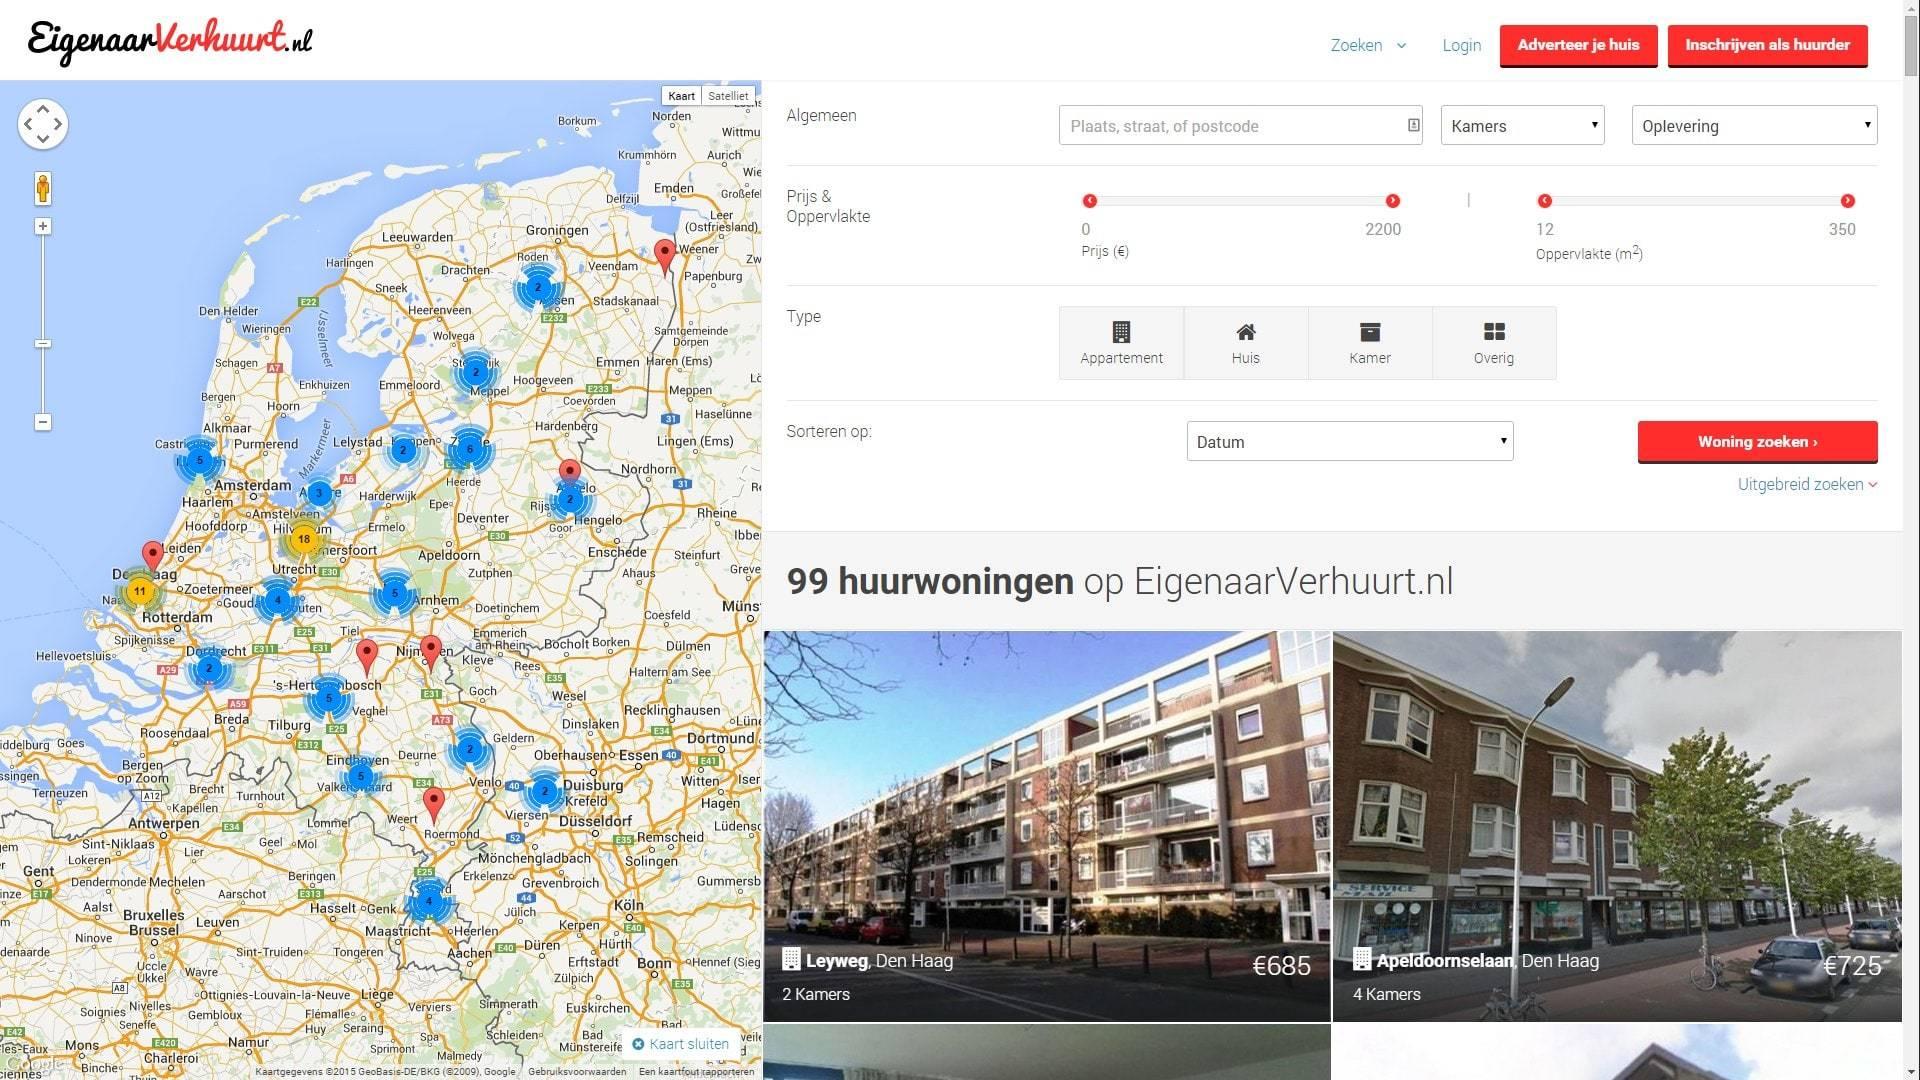 EigenaarVerhuurt.nl Search Filter for Homes